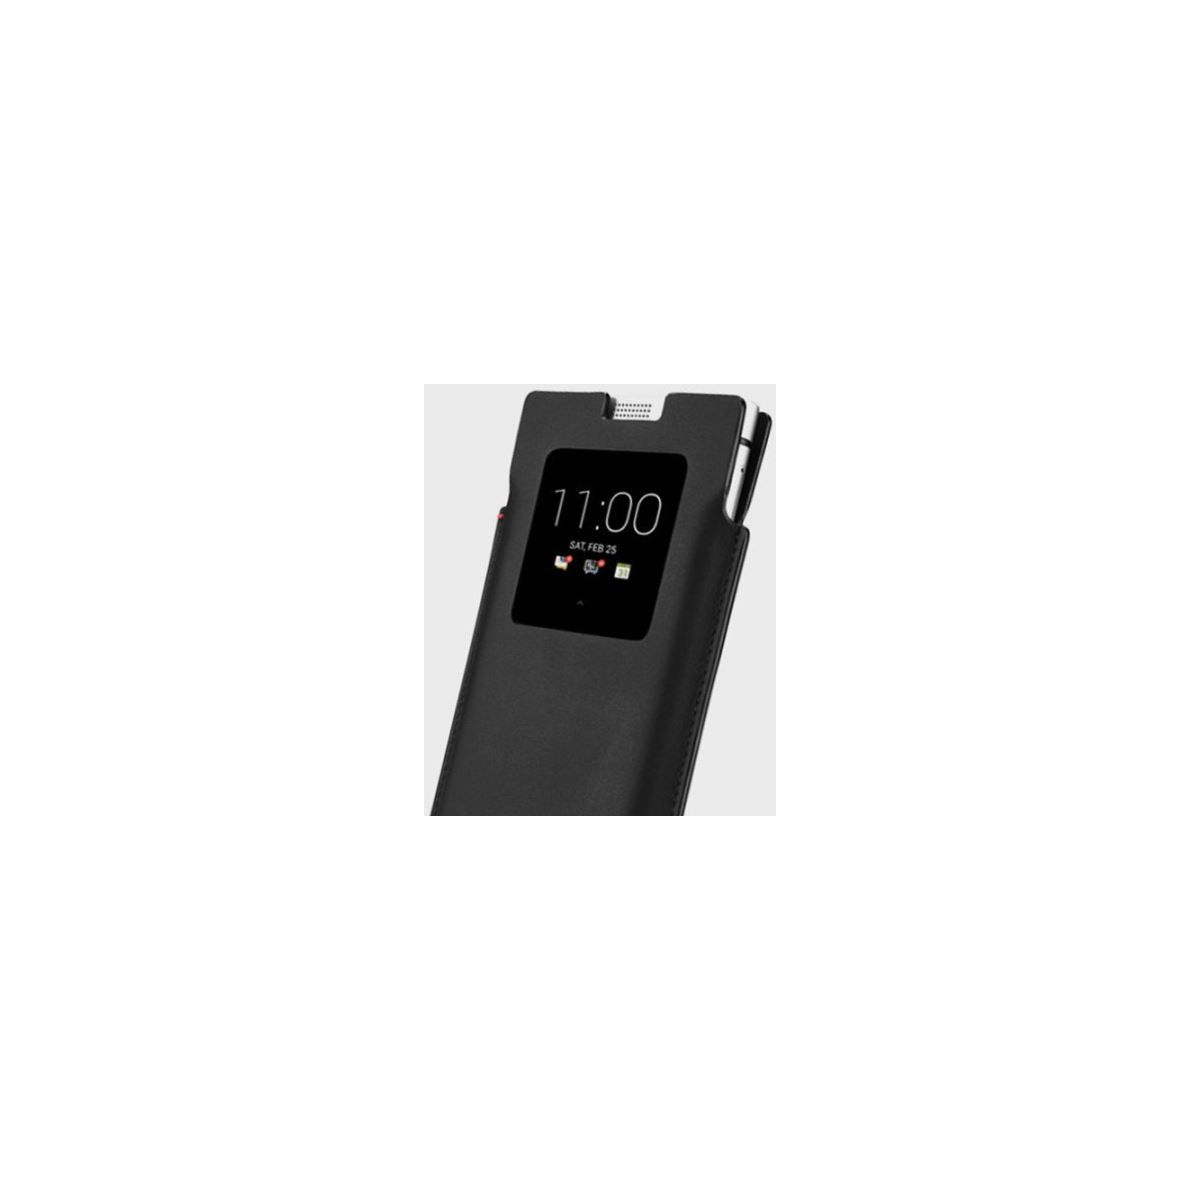 Etui BLACKBERRY Smart Pocket cuir noir